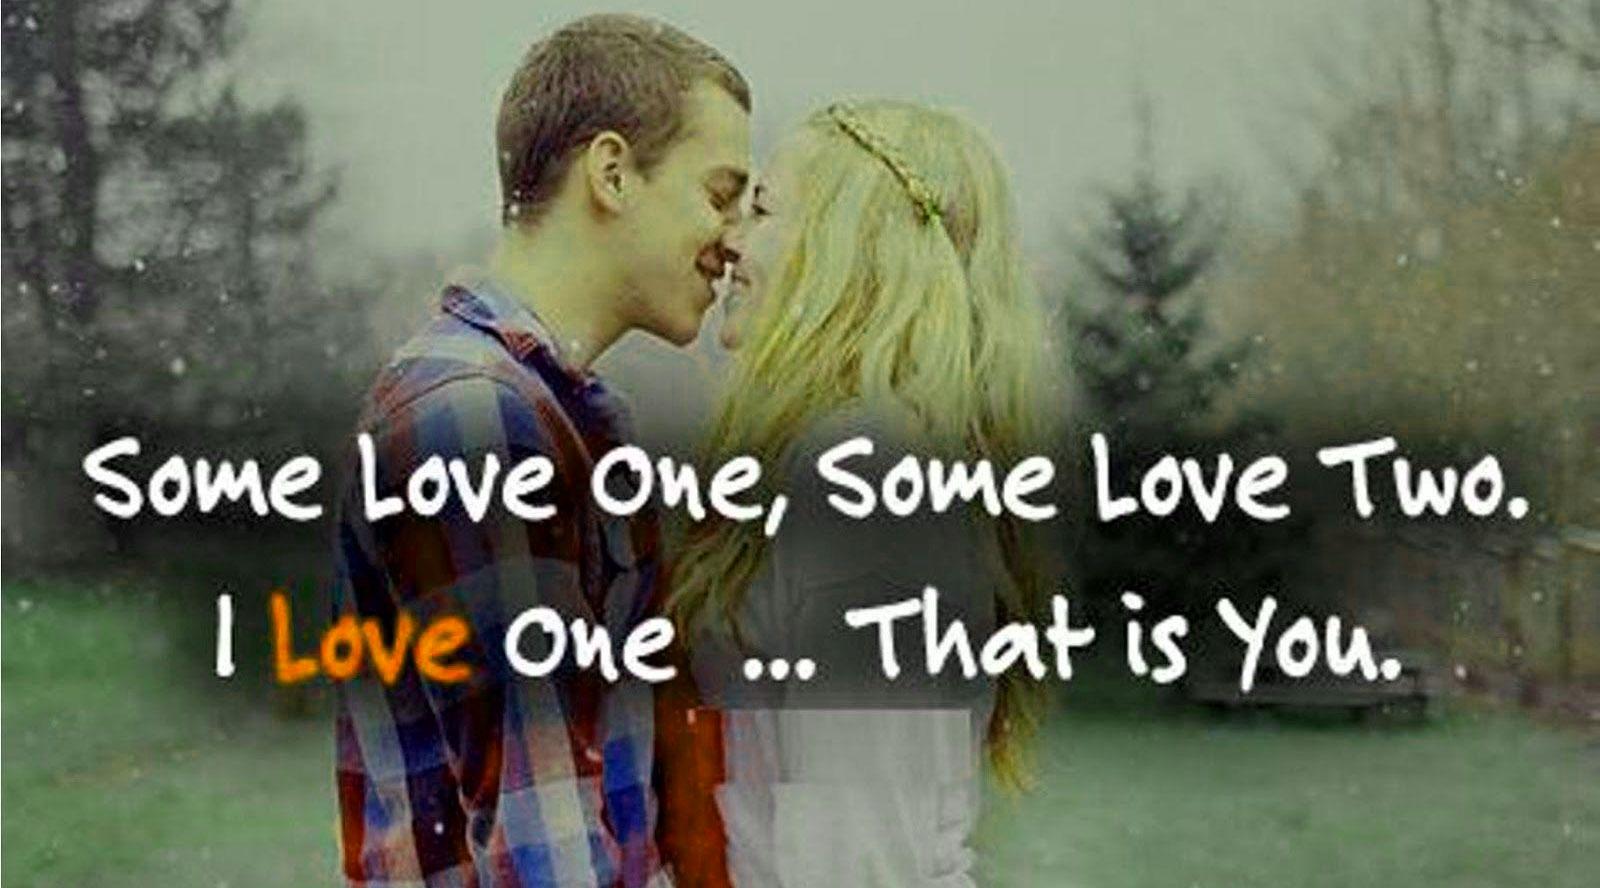 shayari photo download love story 26